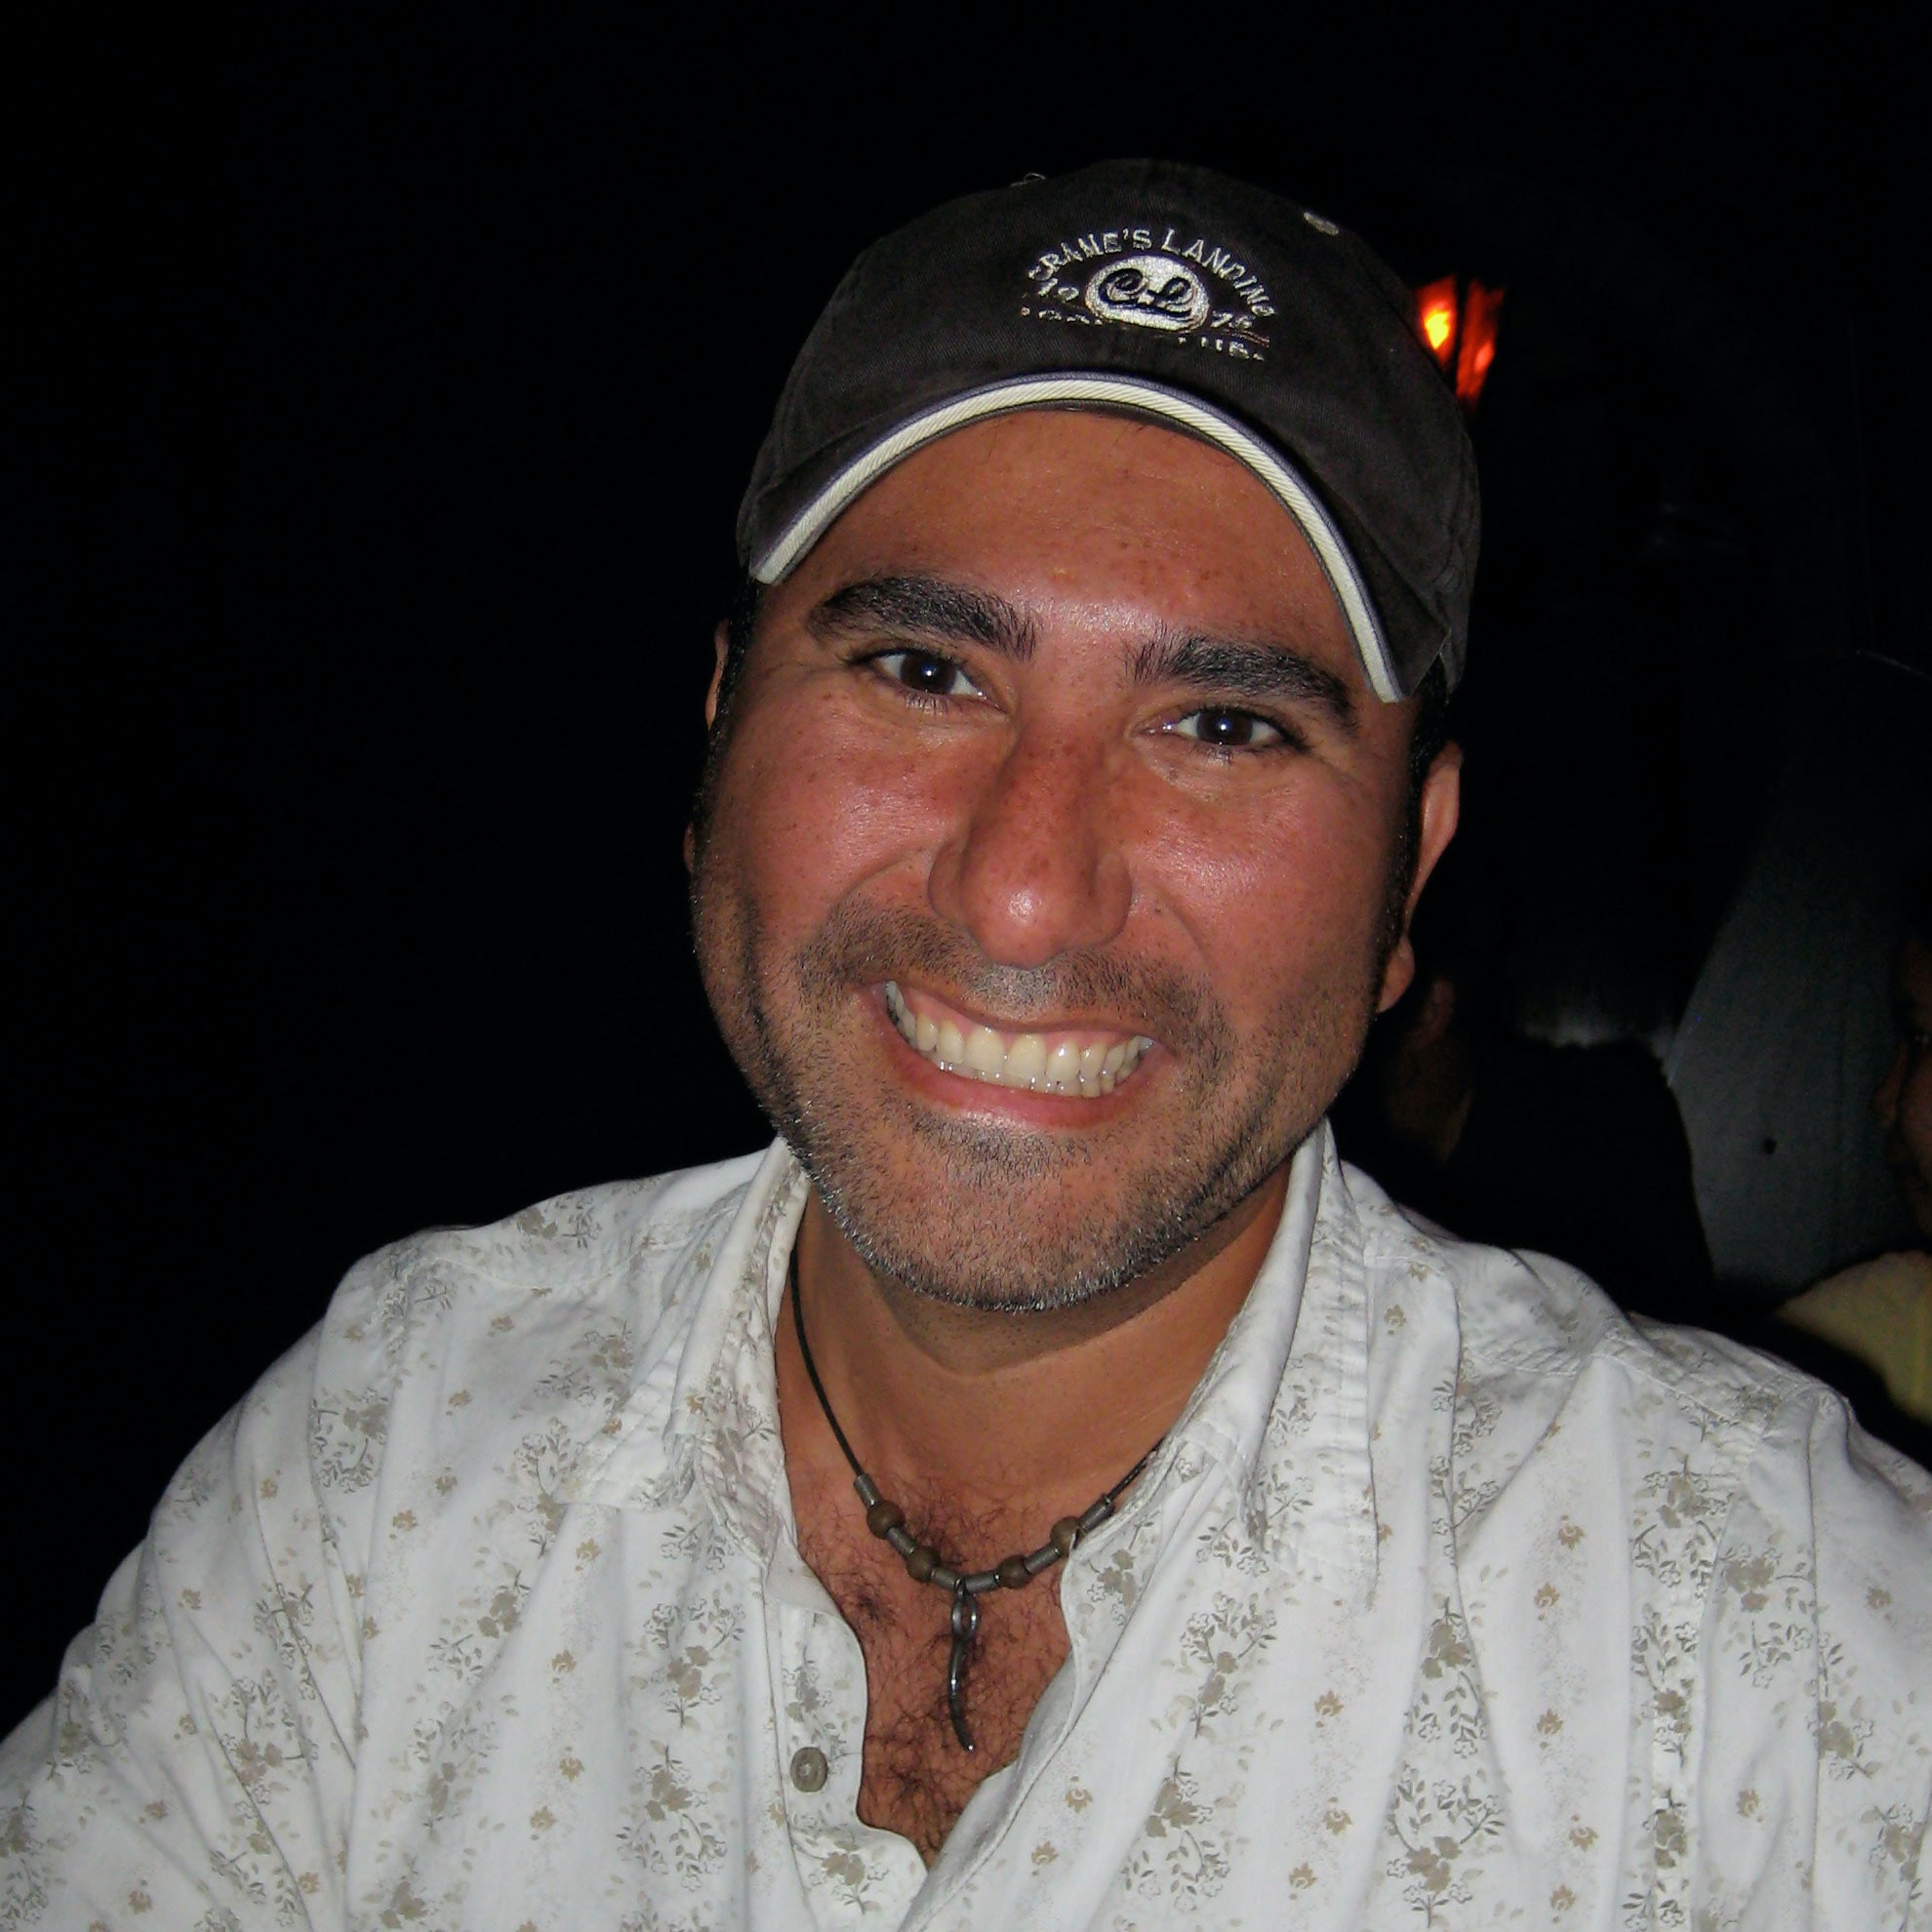 Go to Jaime Andrés Pérez Cadena's profile